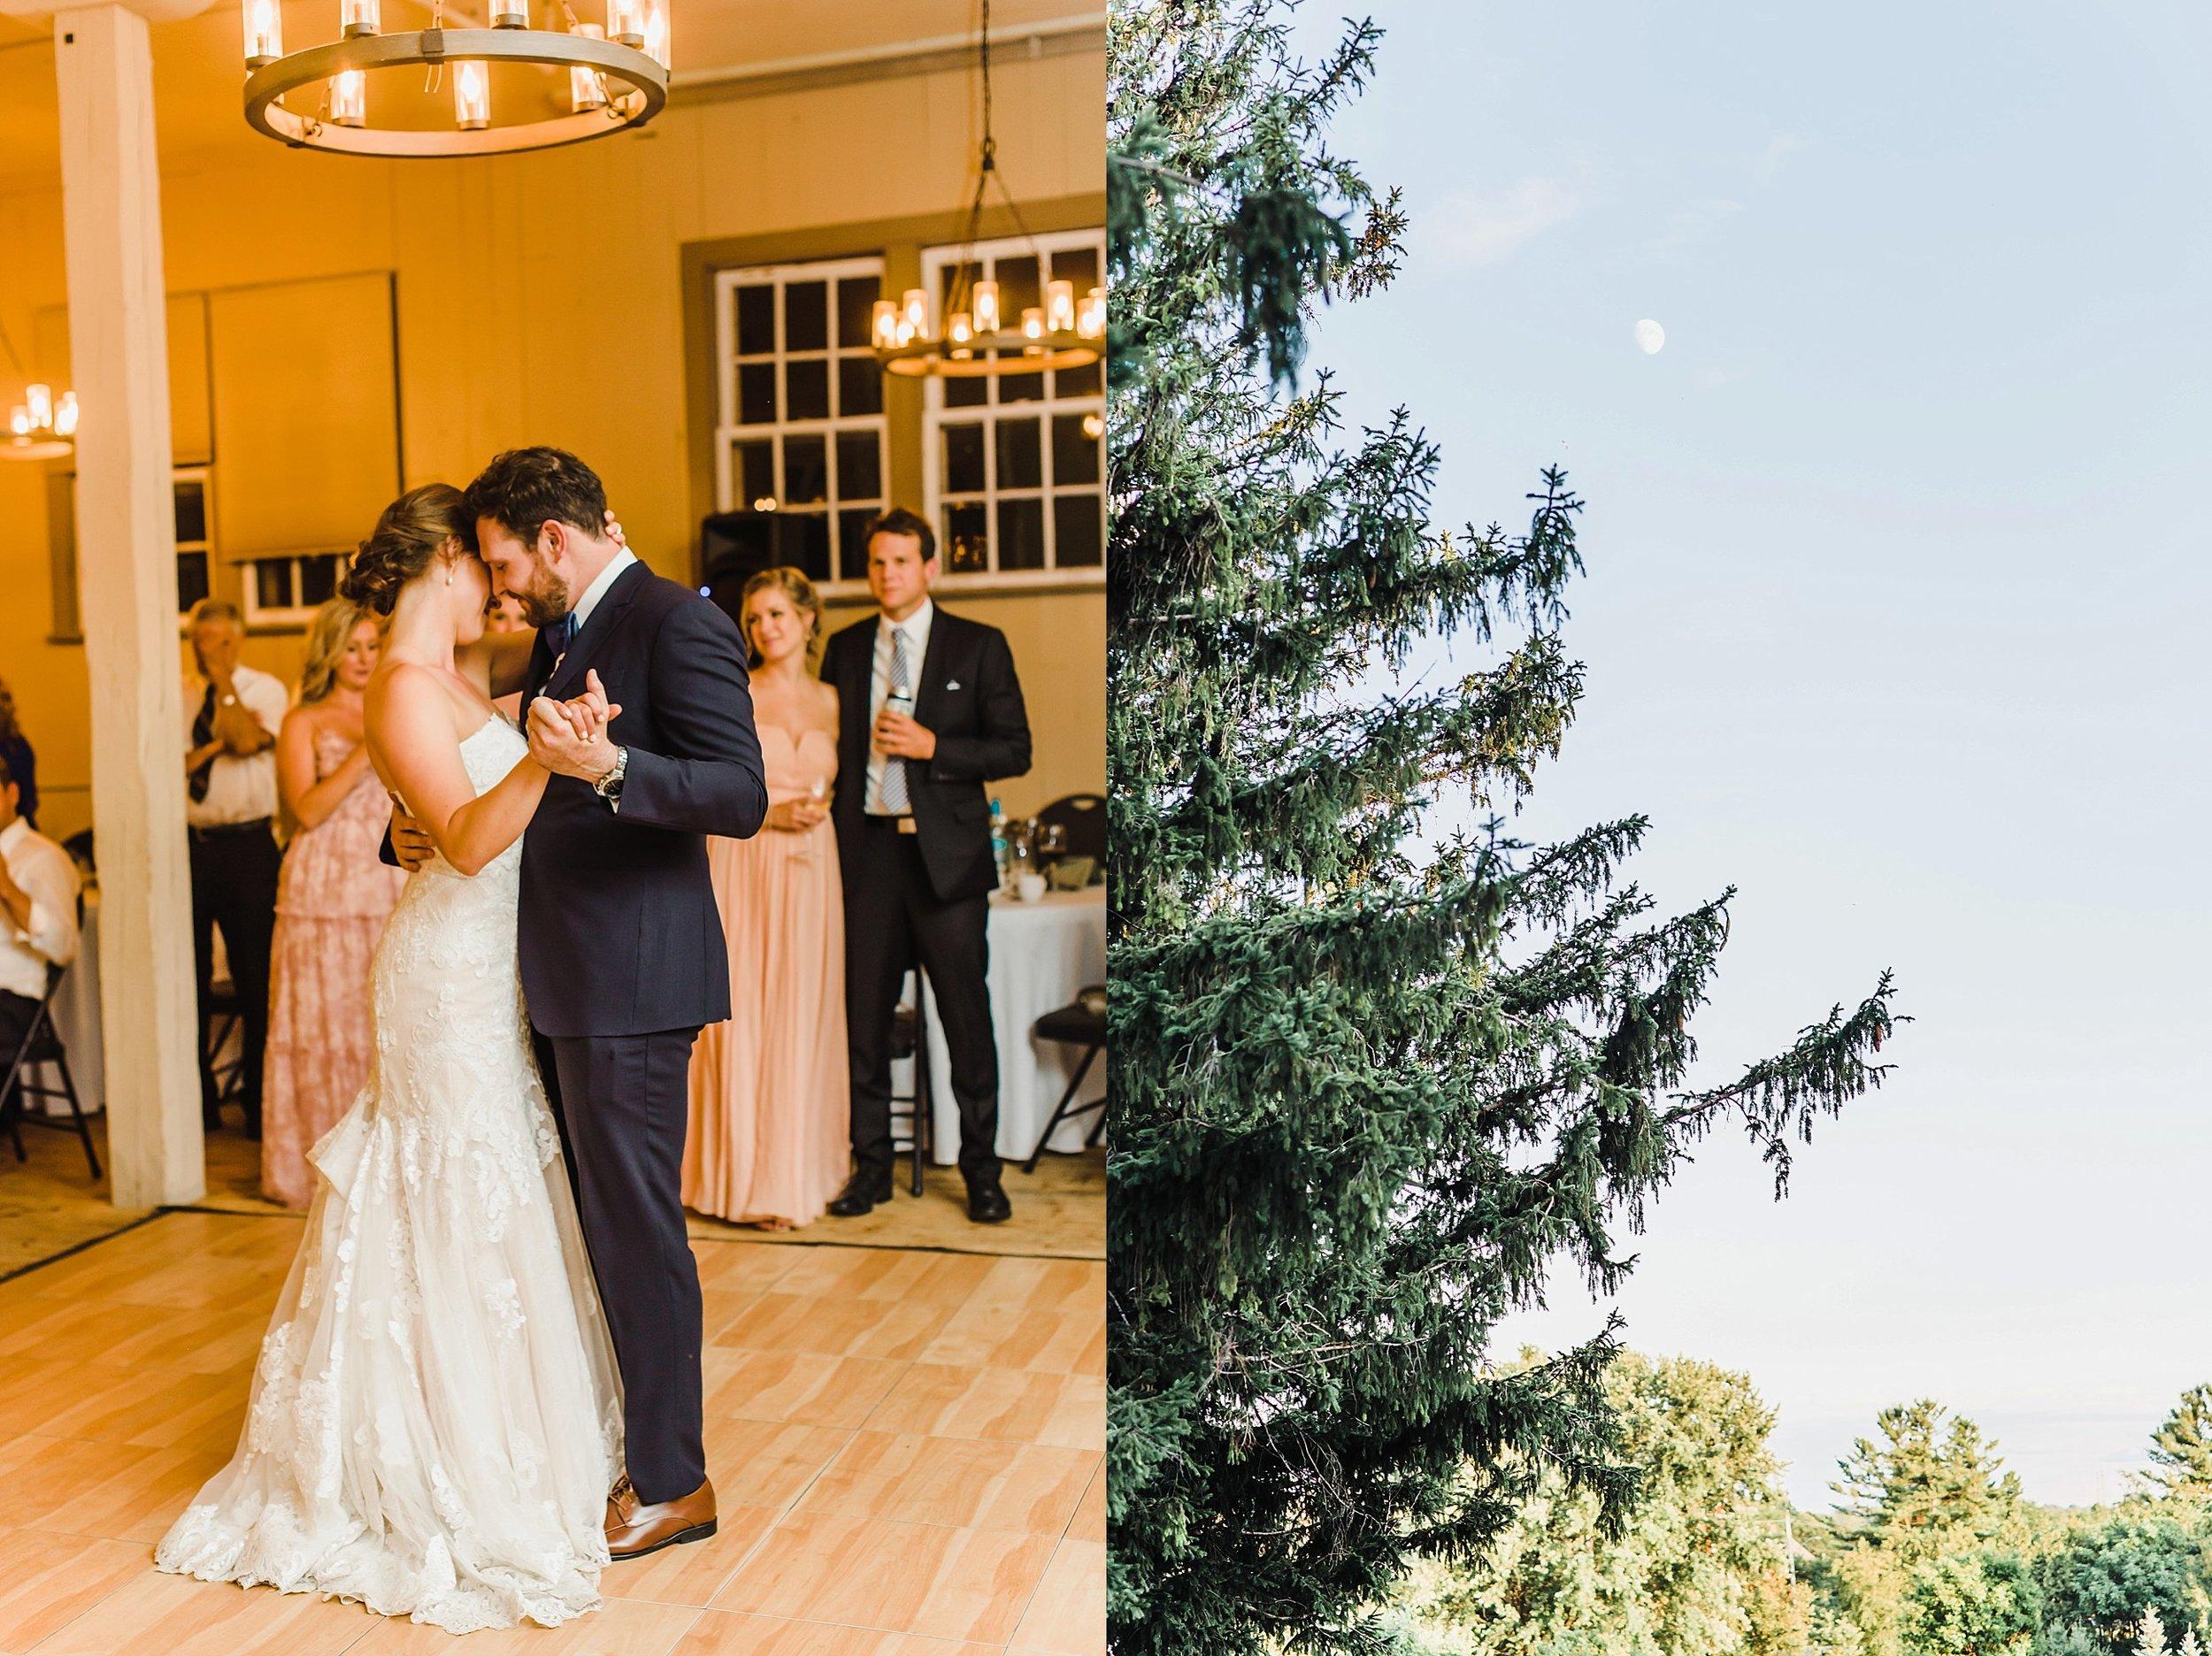 light airy indie fine art ottawa wedding photographer   Ali and Batoul Photography_1070.jpg